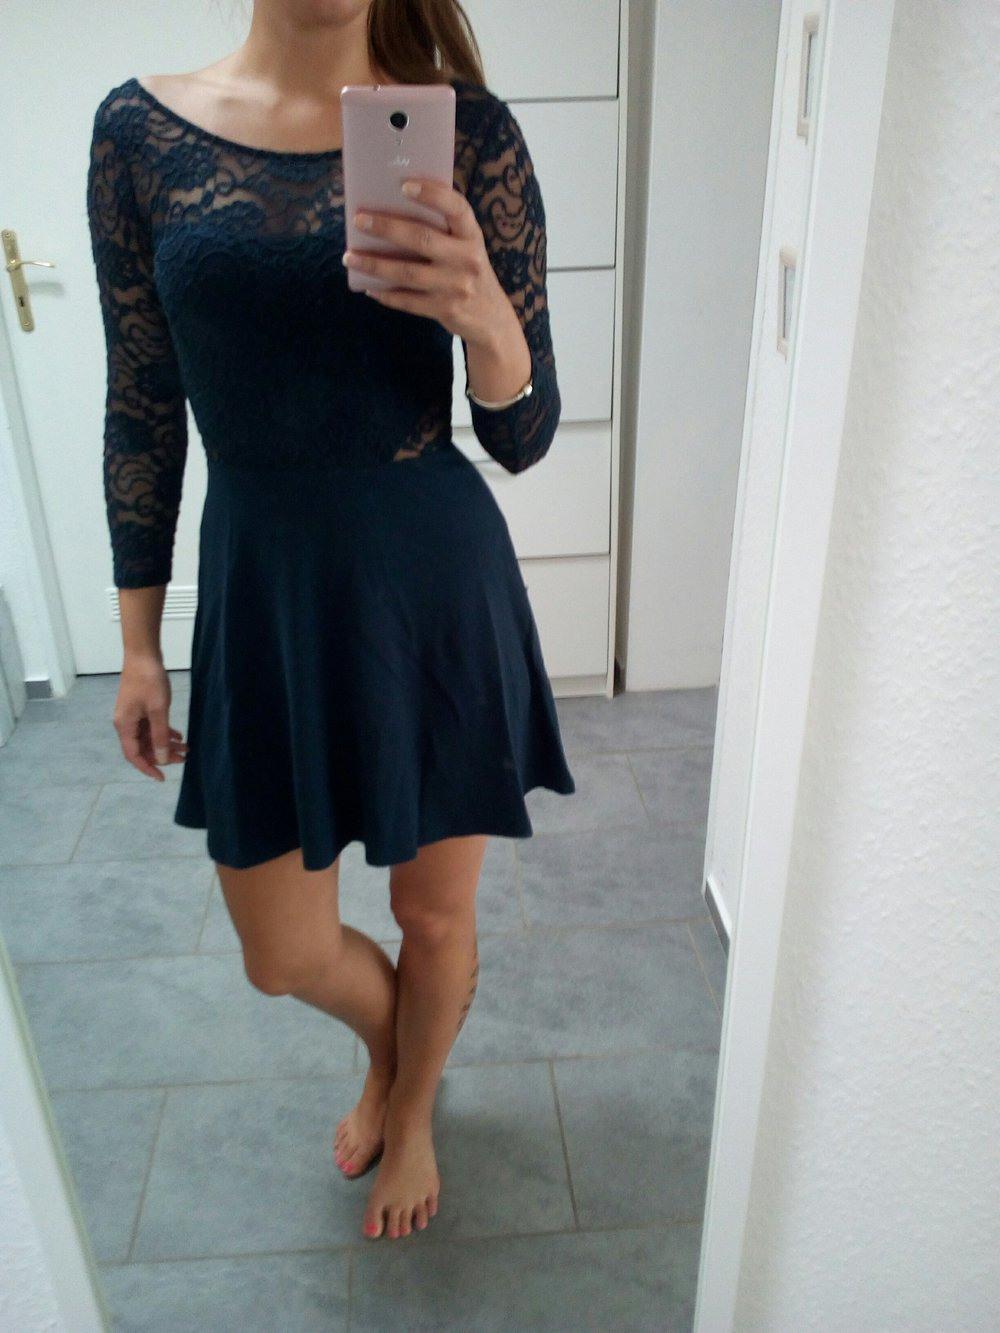 Kreativ Dunkelblaues Kurzes Kleid Bester Preis17 Wunderbar Dunkelblaues Kurzes Kleid Boutique